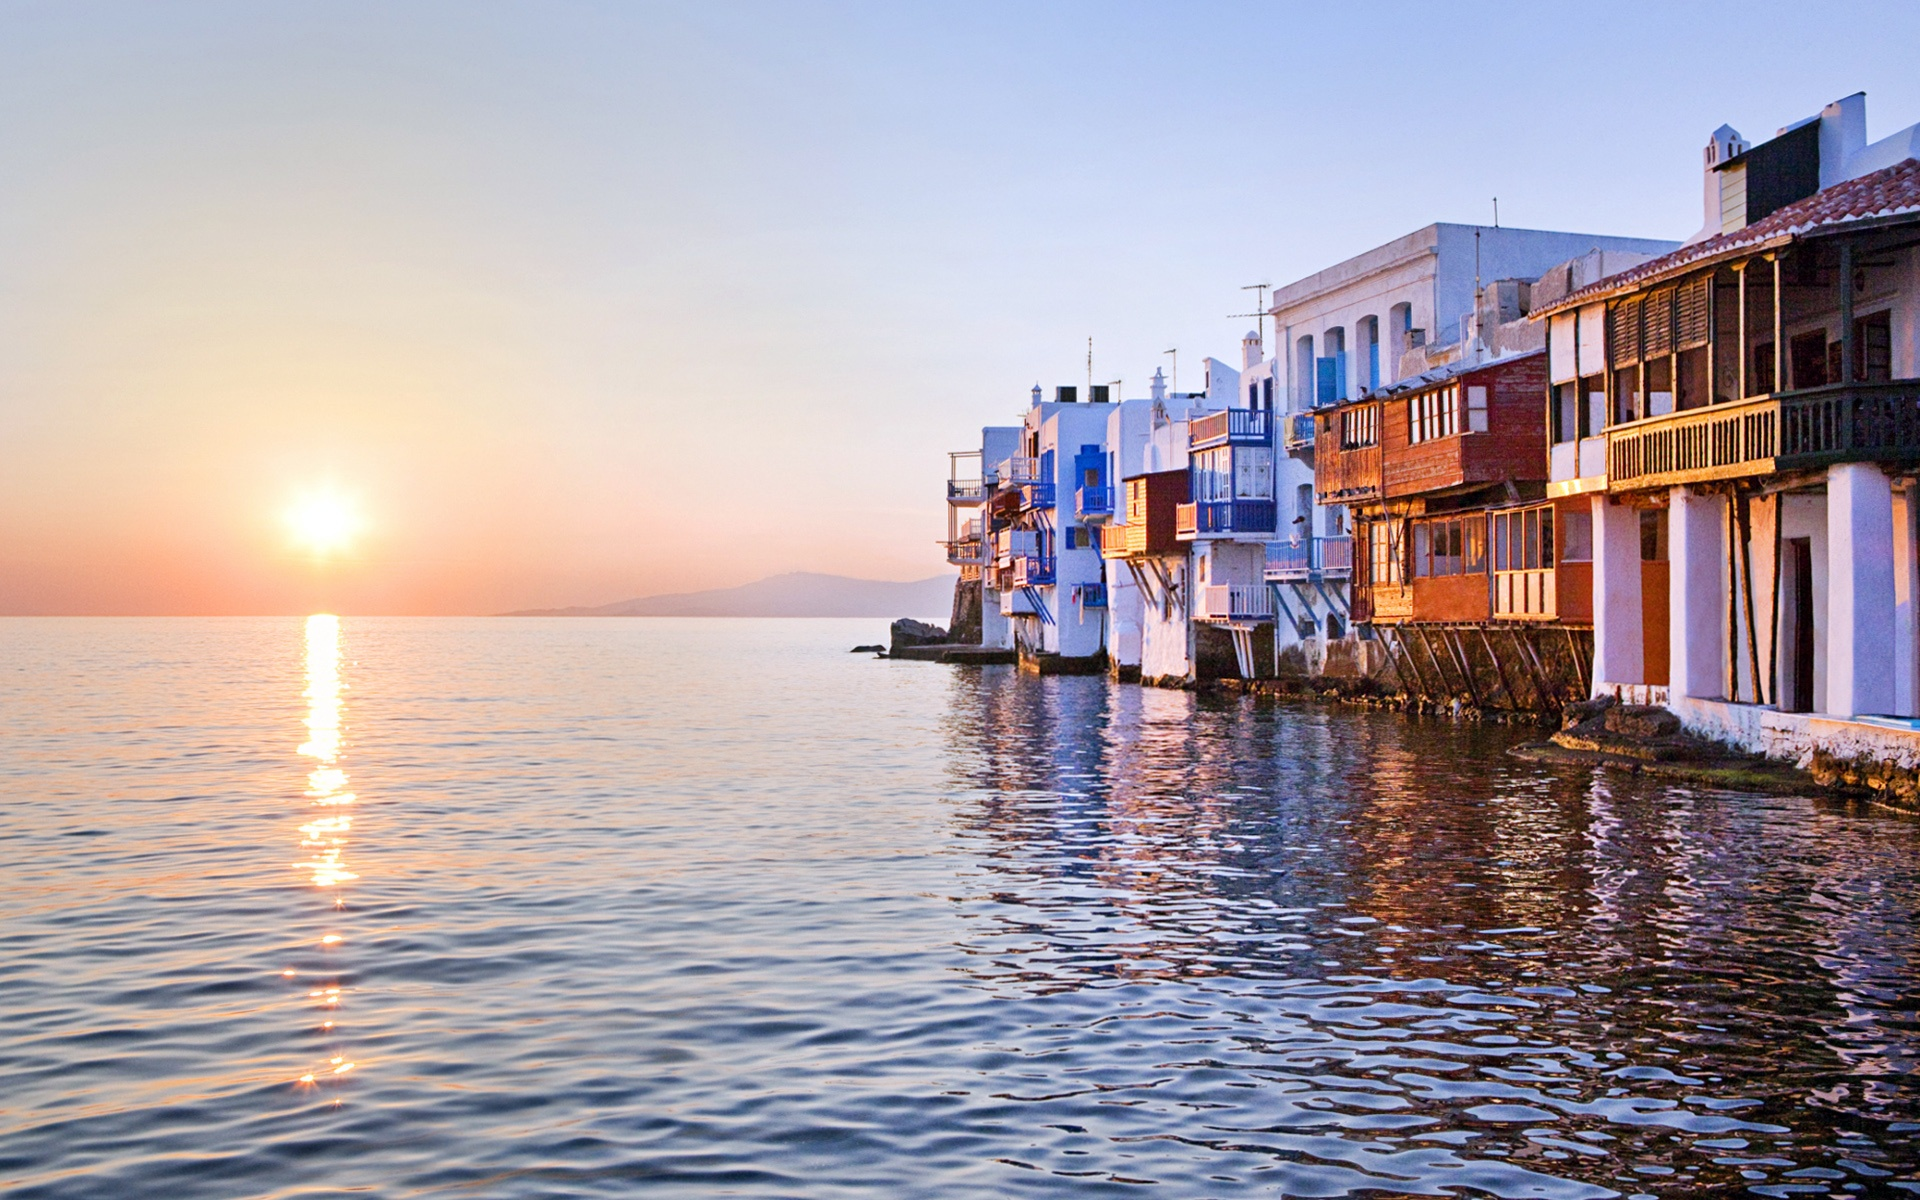 Haus am meer bei sonnenuntergang  Sonnenuntergang reflektiert über Meer, Klein-Venedig, Mykonos ...